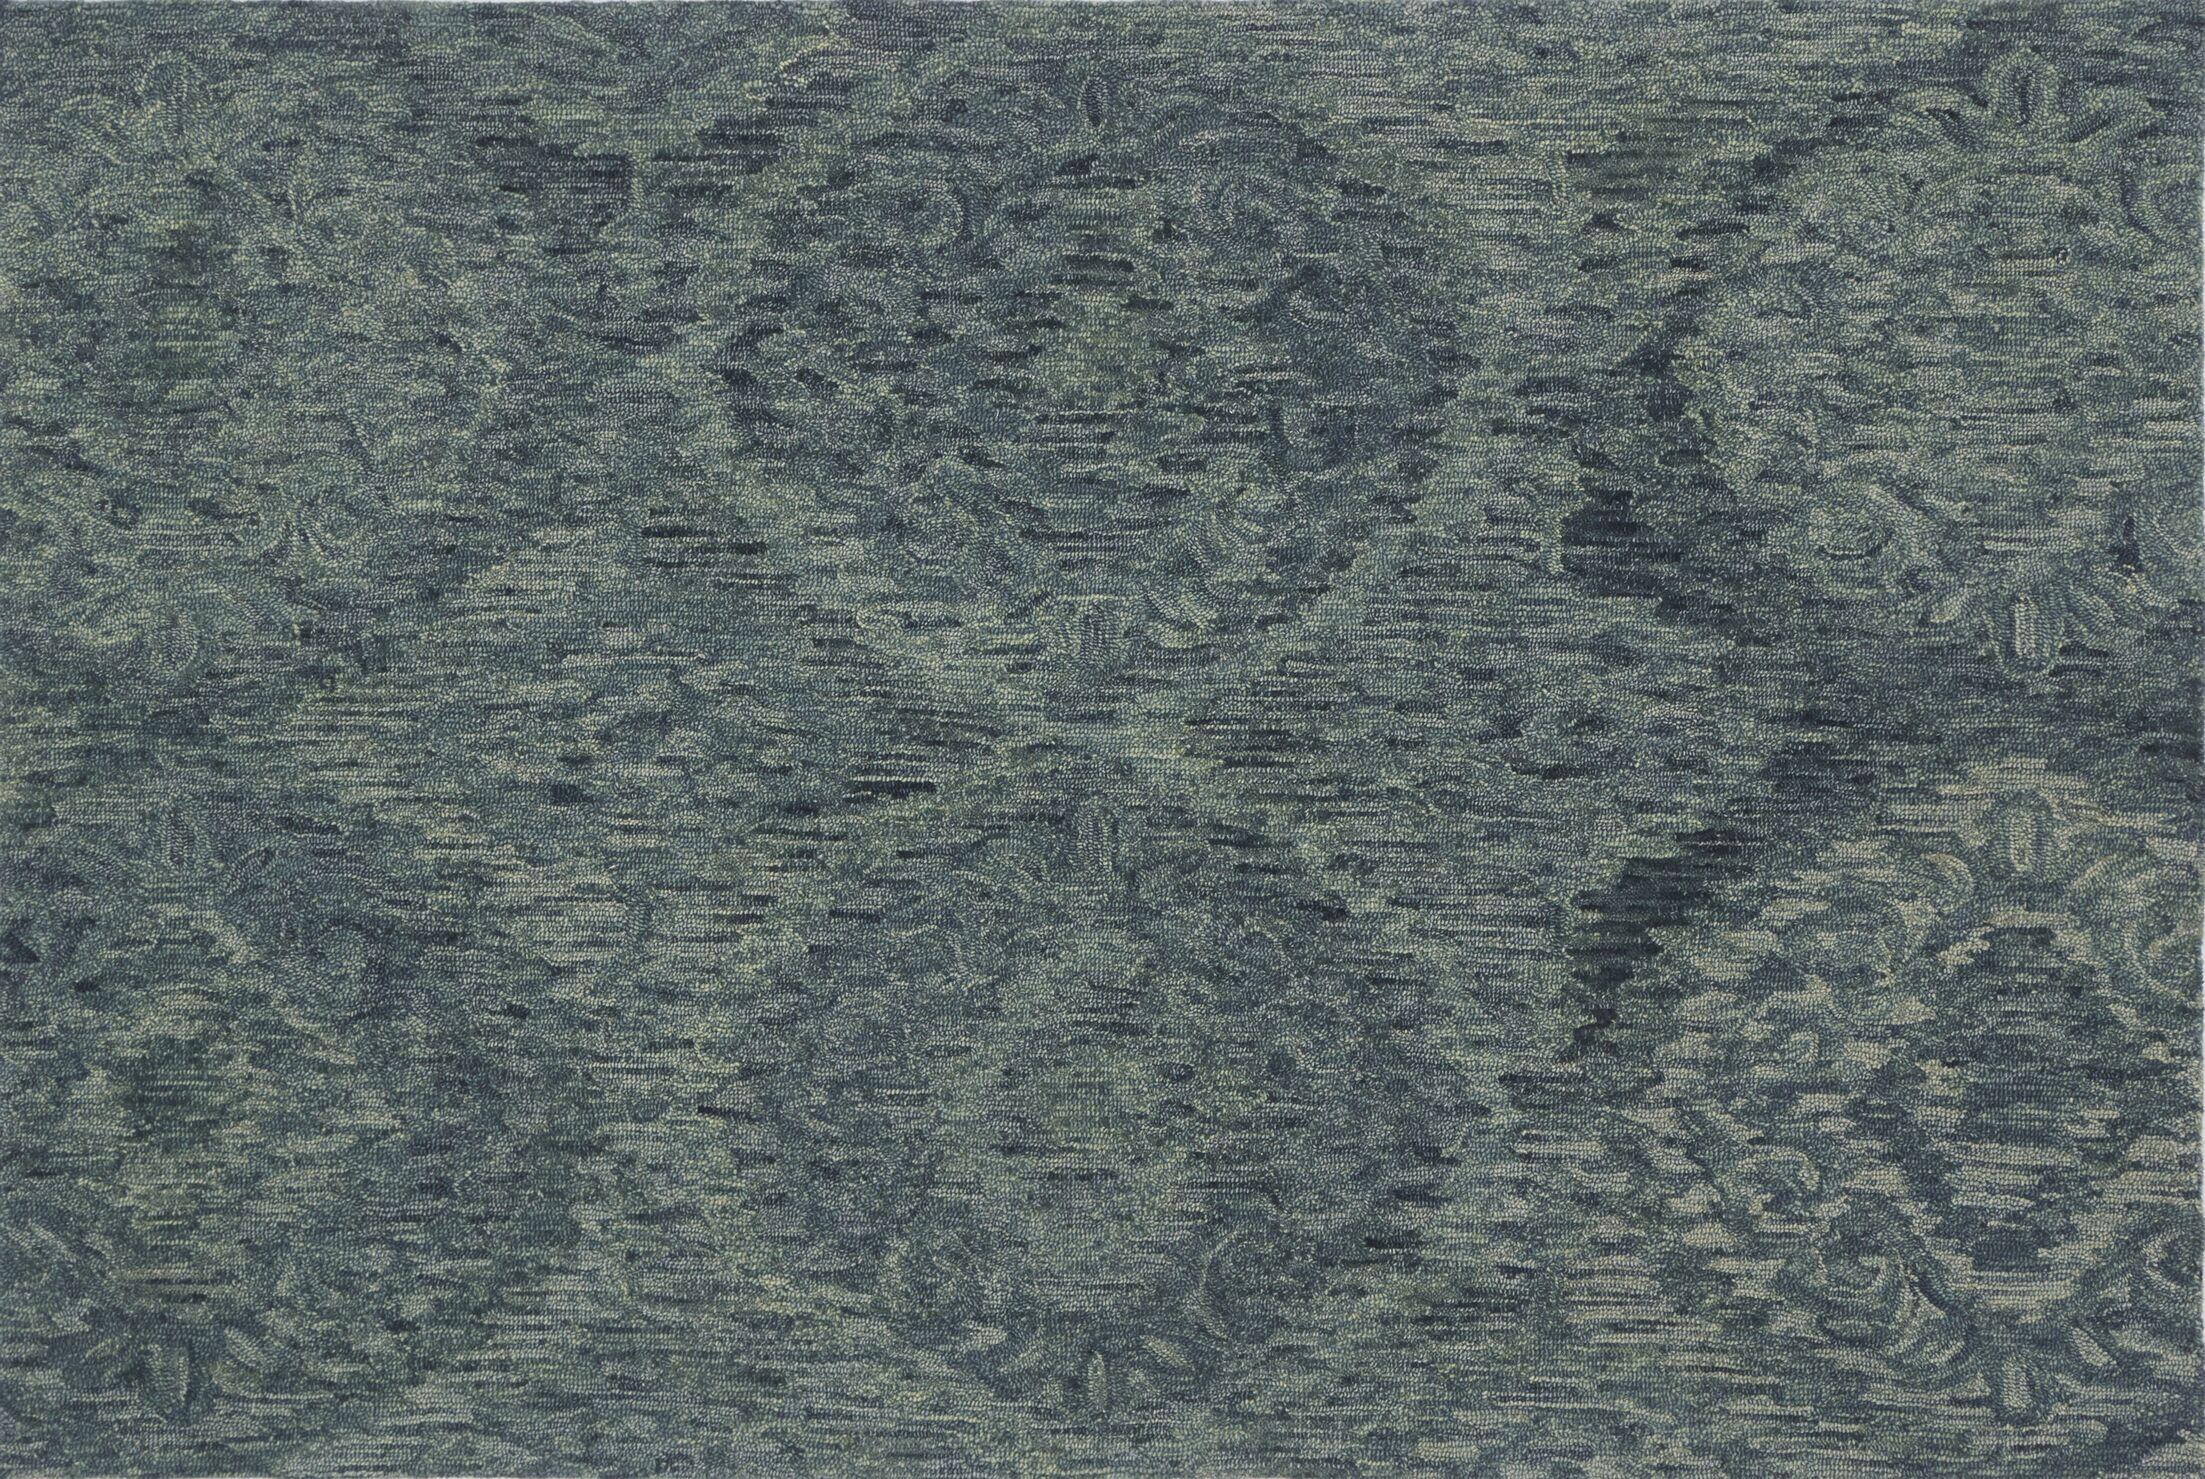 Cherrelle Hand-Hooked Wool Teal Area Rug Rug Size: Rectangle 5' x 7'6